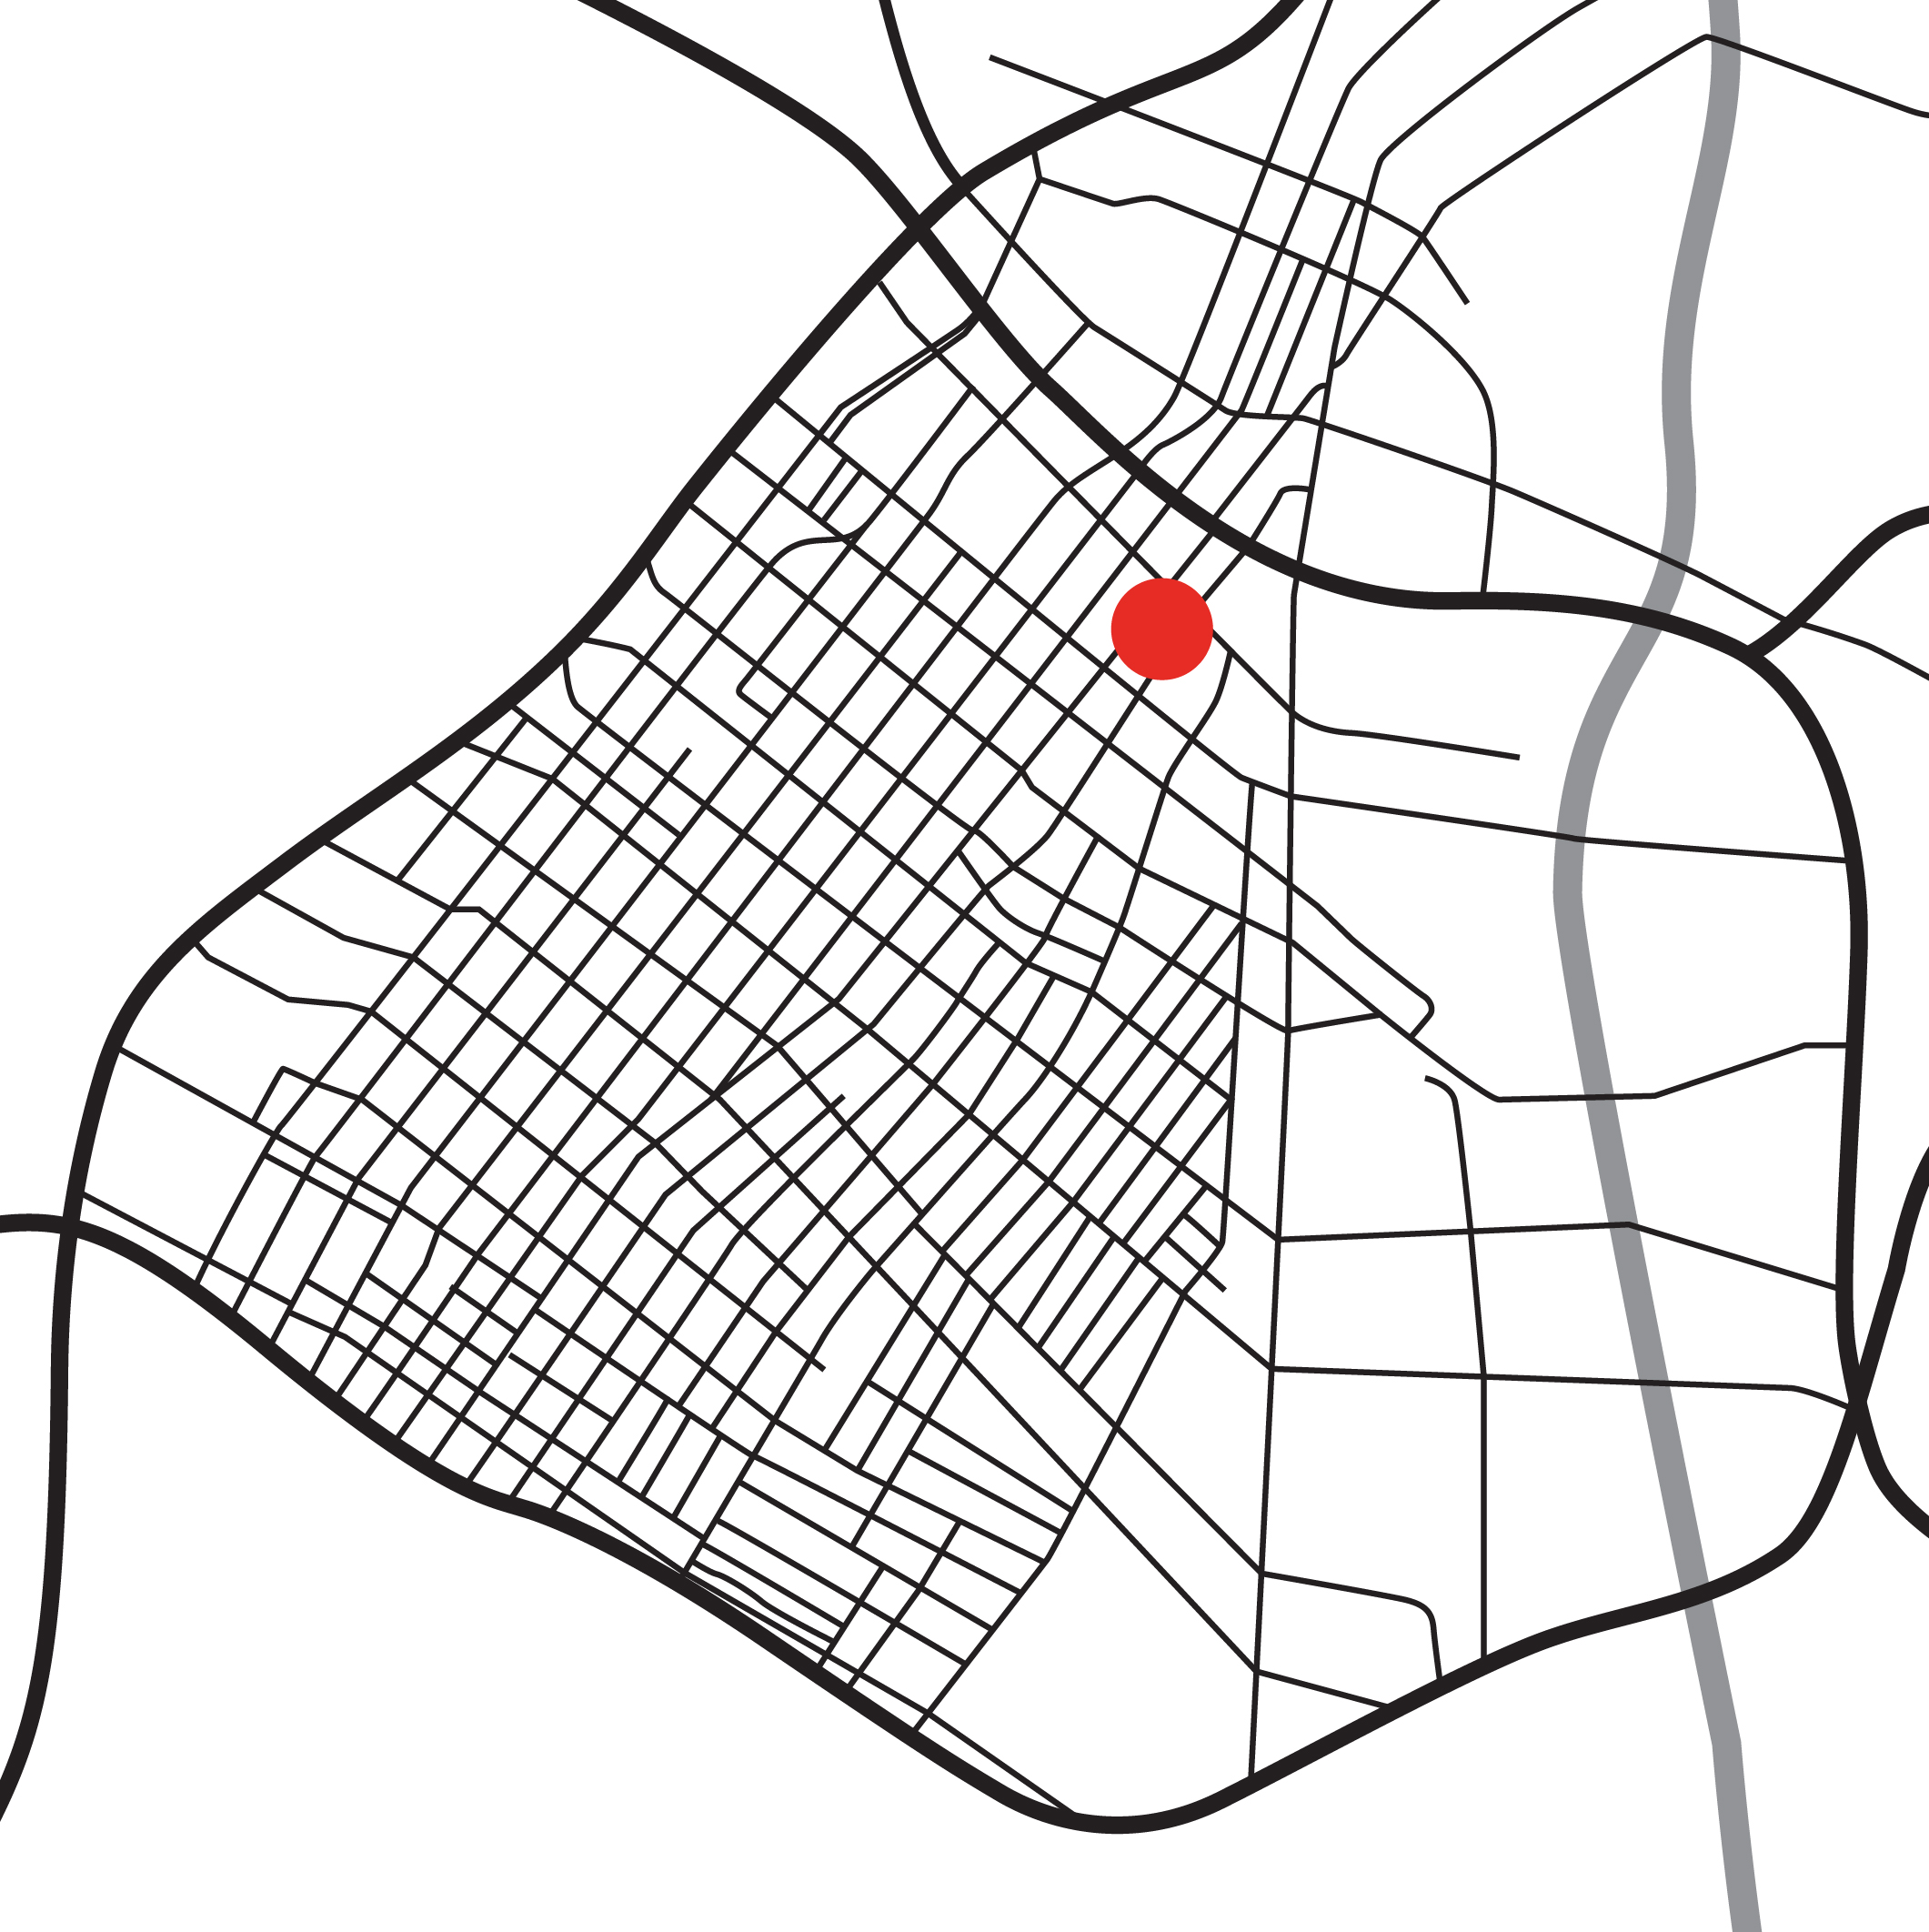 DTLA_MAP_003_City Hall East-01.jpg